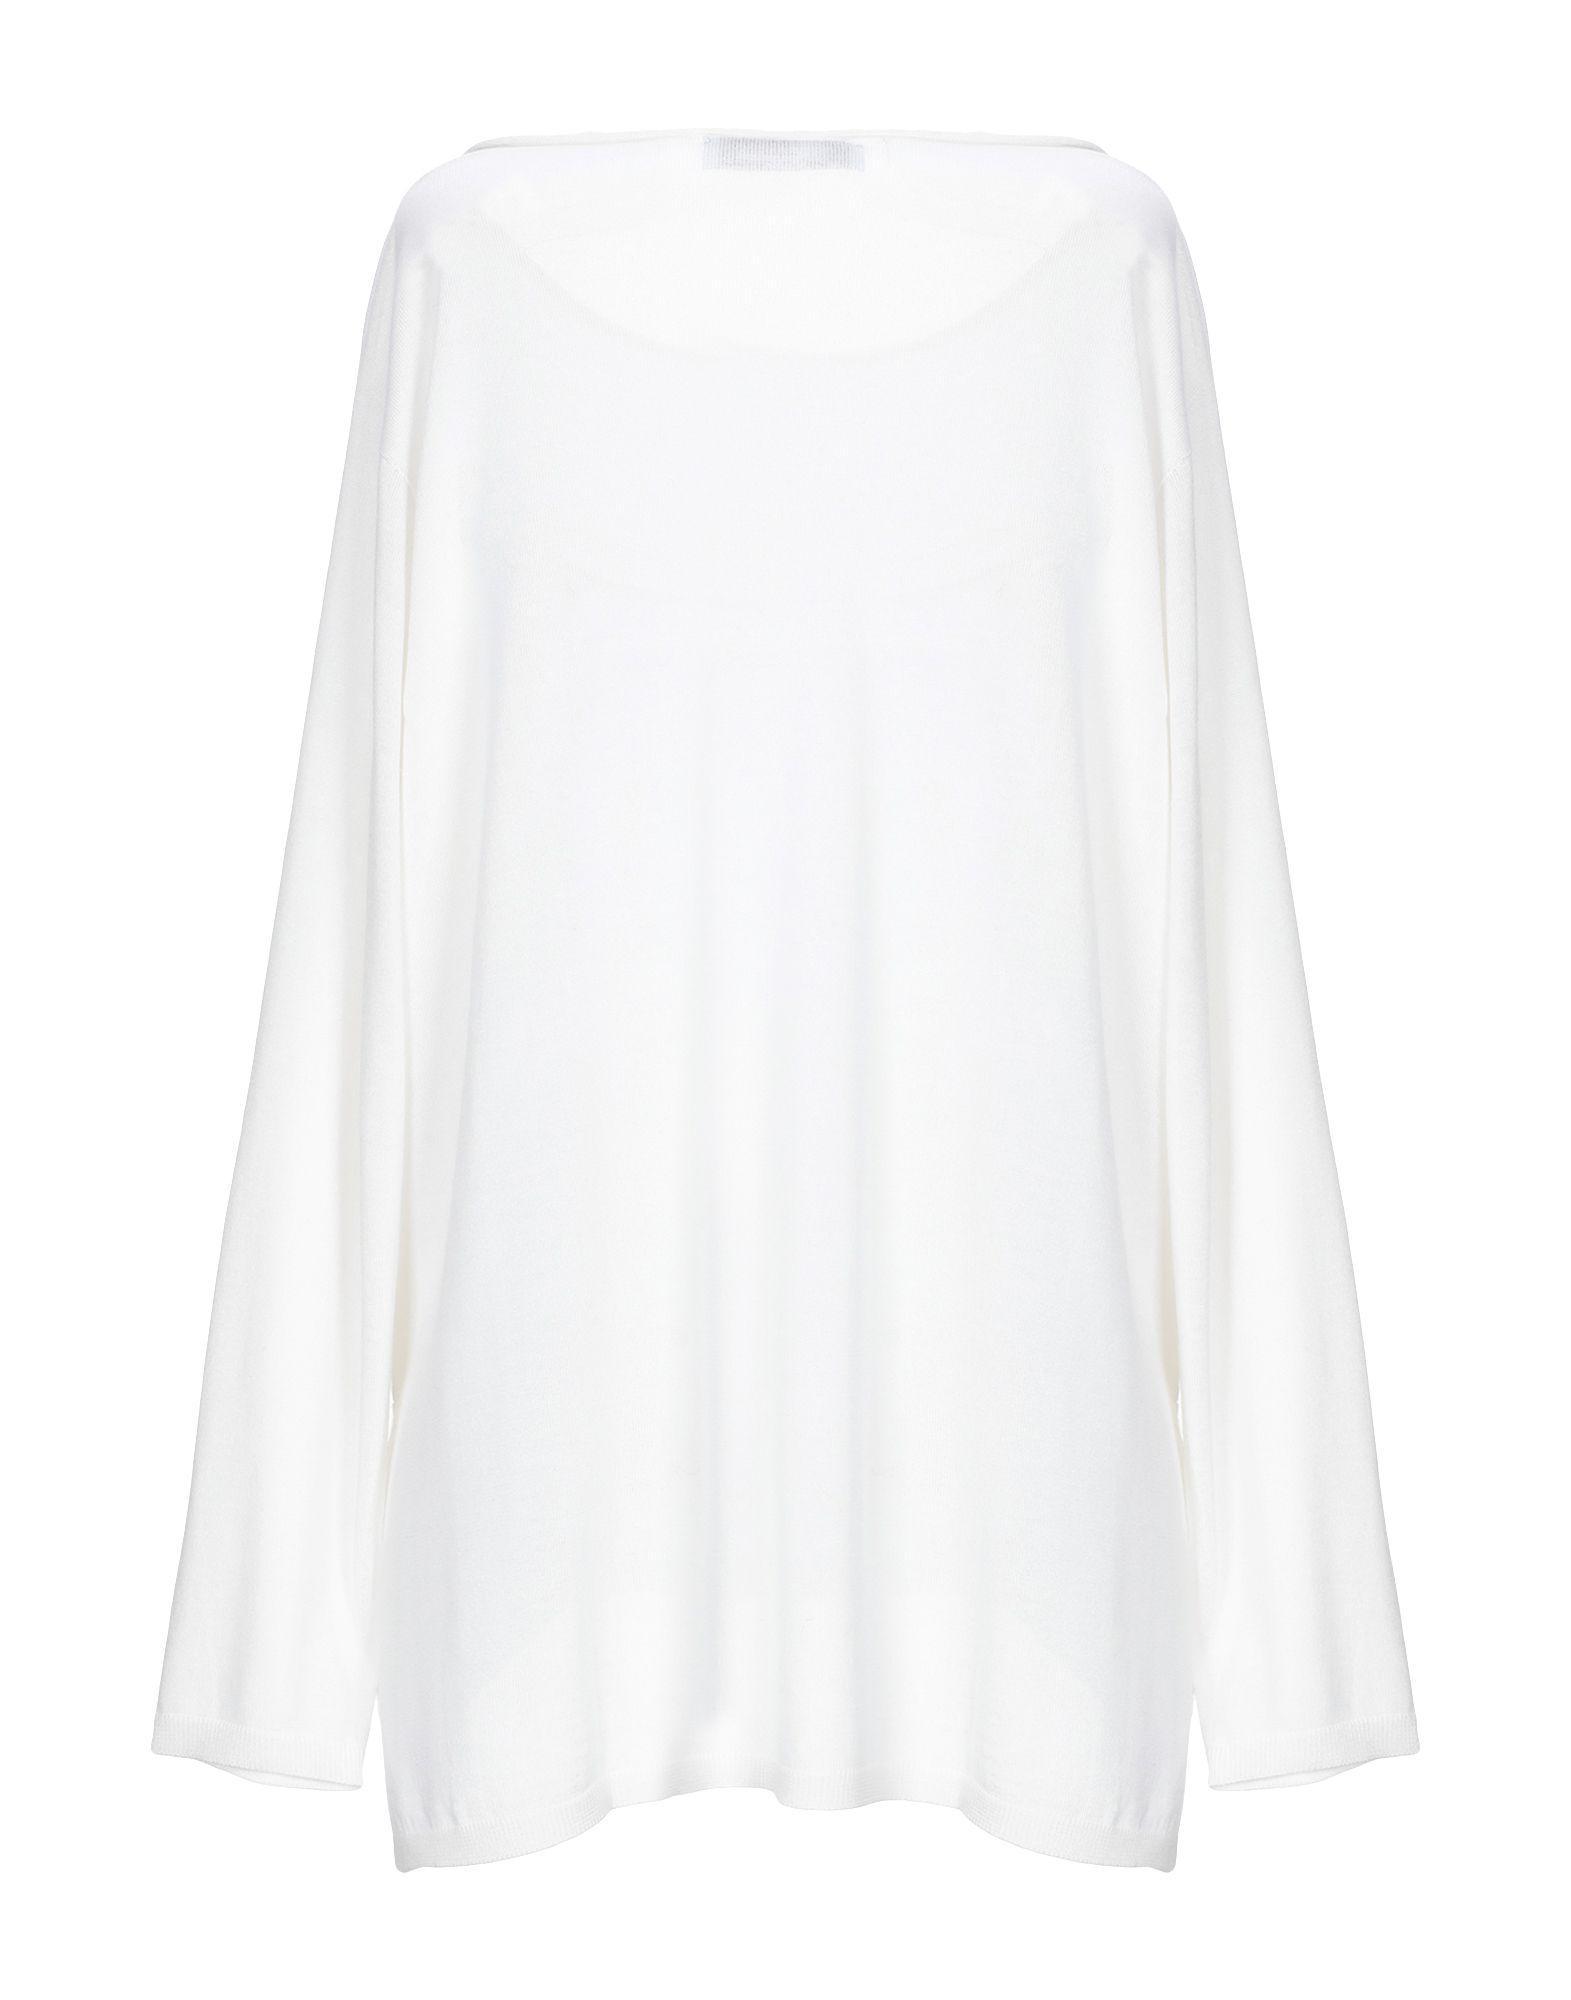 Pullover Cachemire Blumarine en coloris Blanc